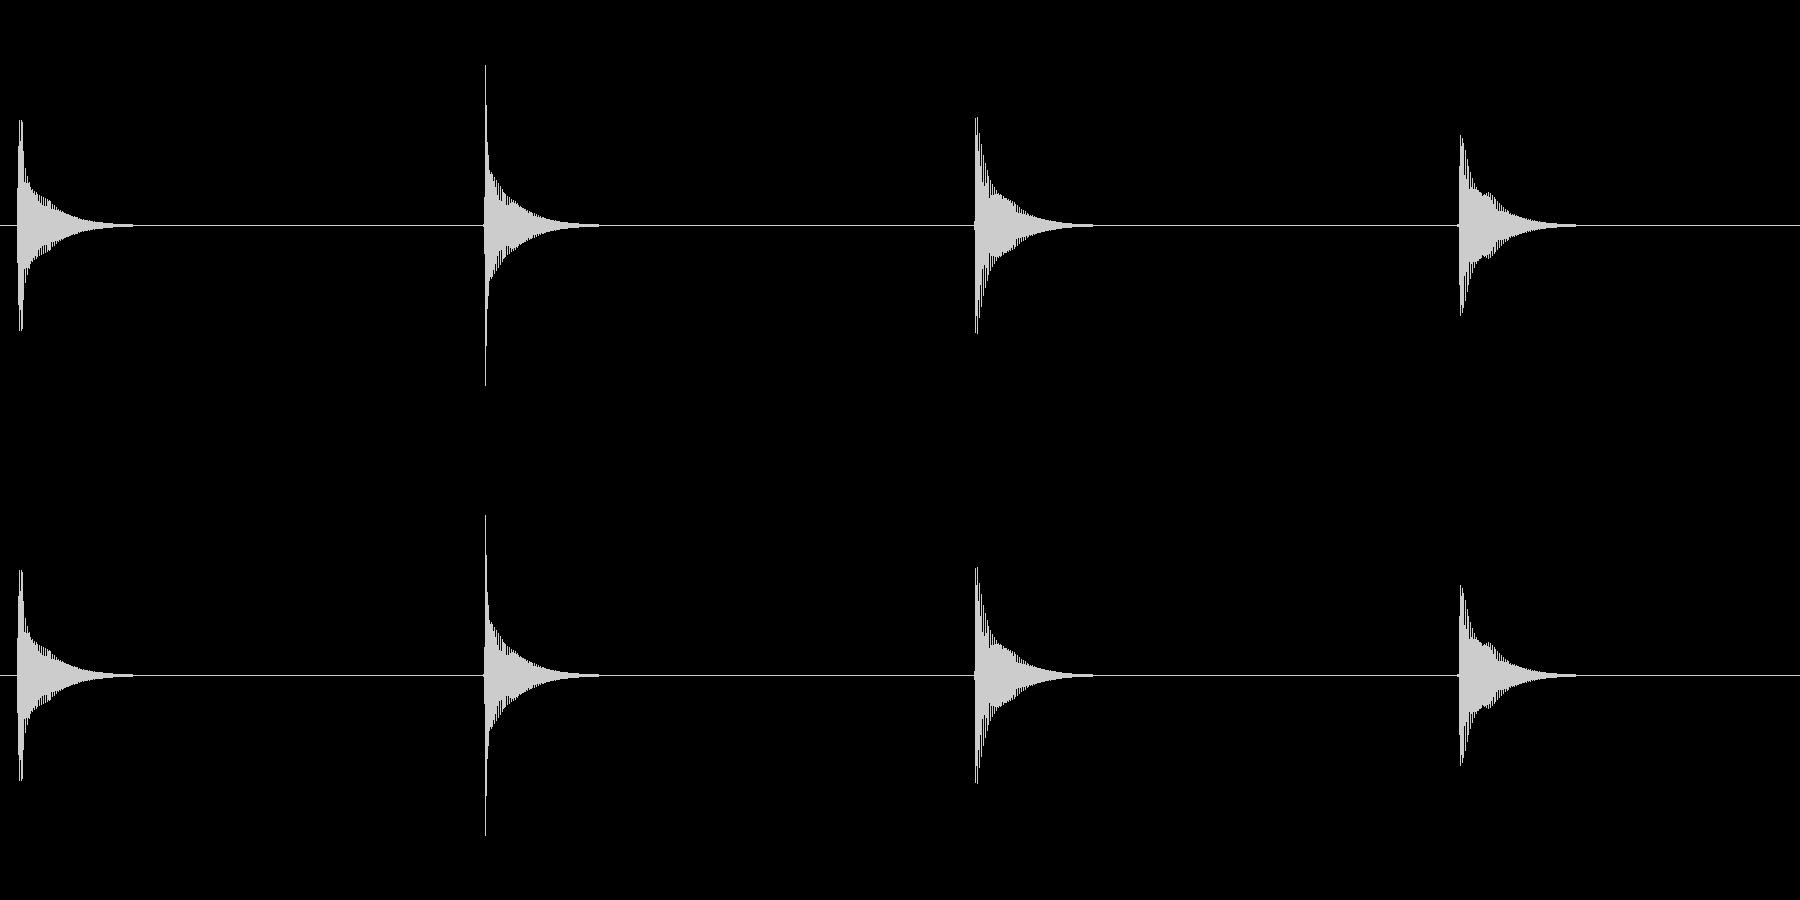 【SE 効果音】てんてんてんてんの未再生の波形